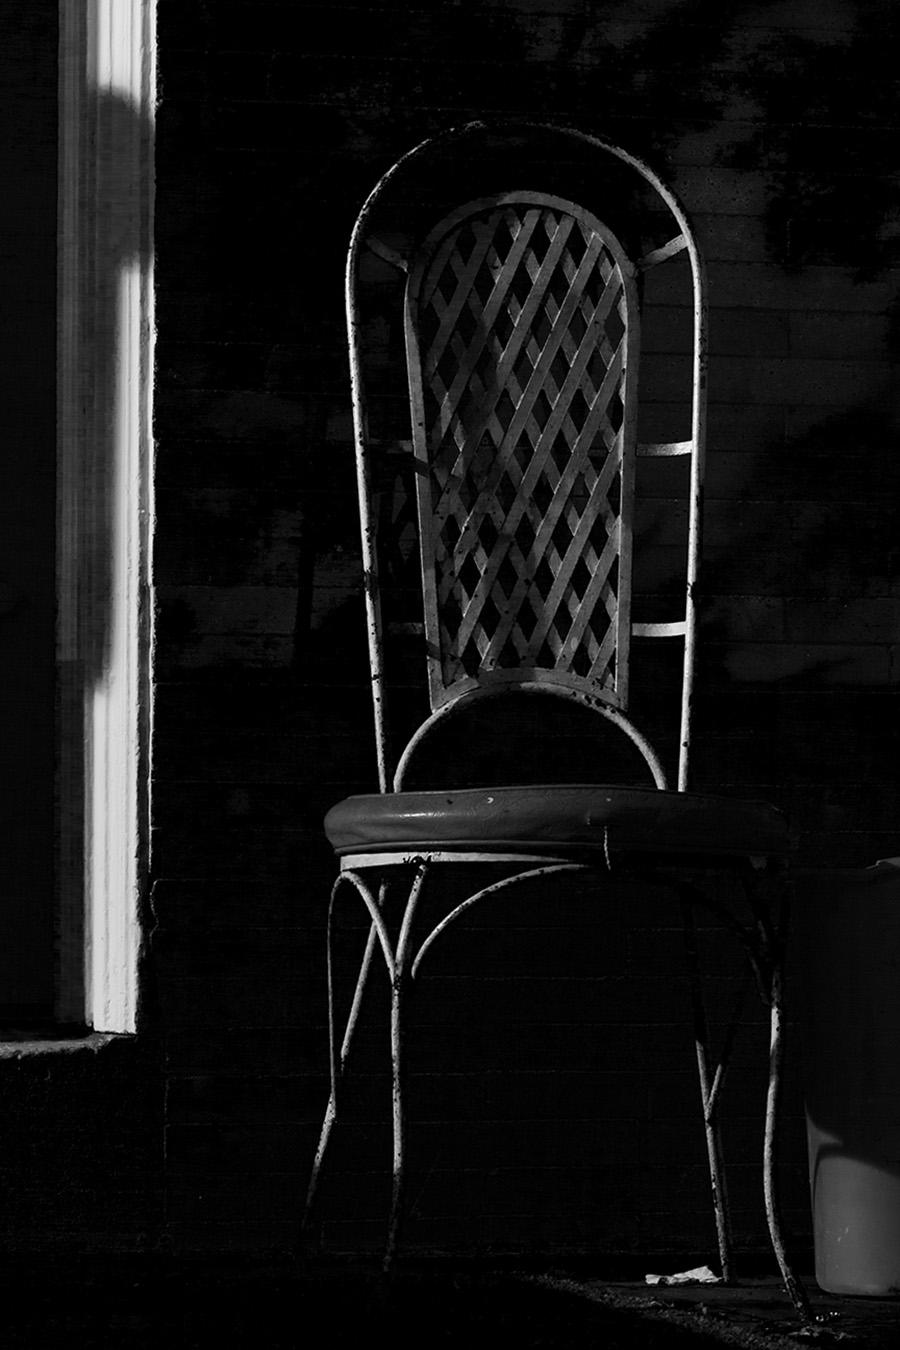 Jesse_Halpern_Still_Life_Poarch_Metal_Chair_Grayscale